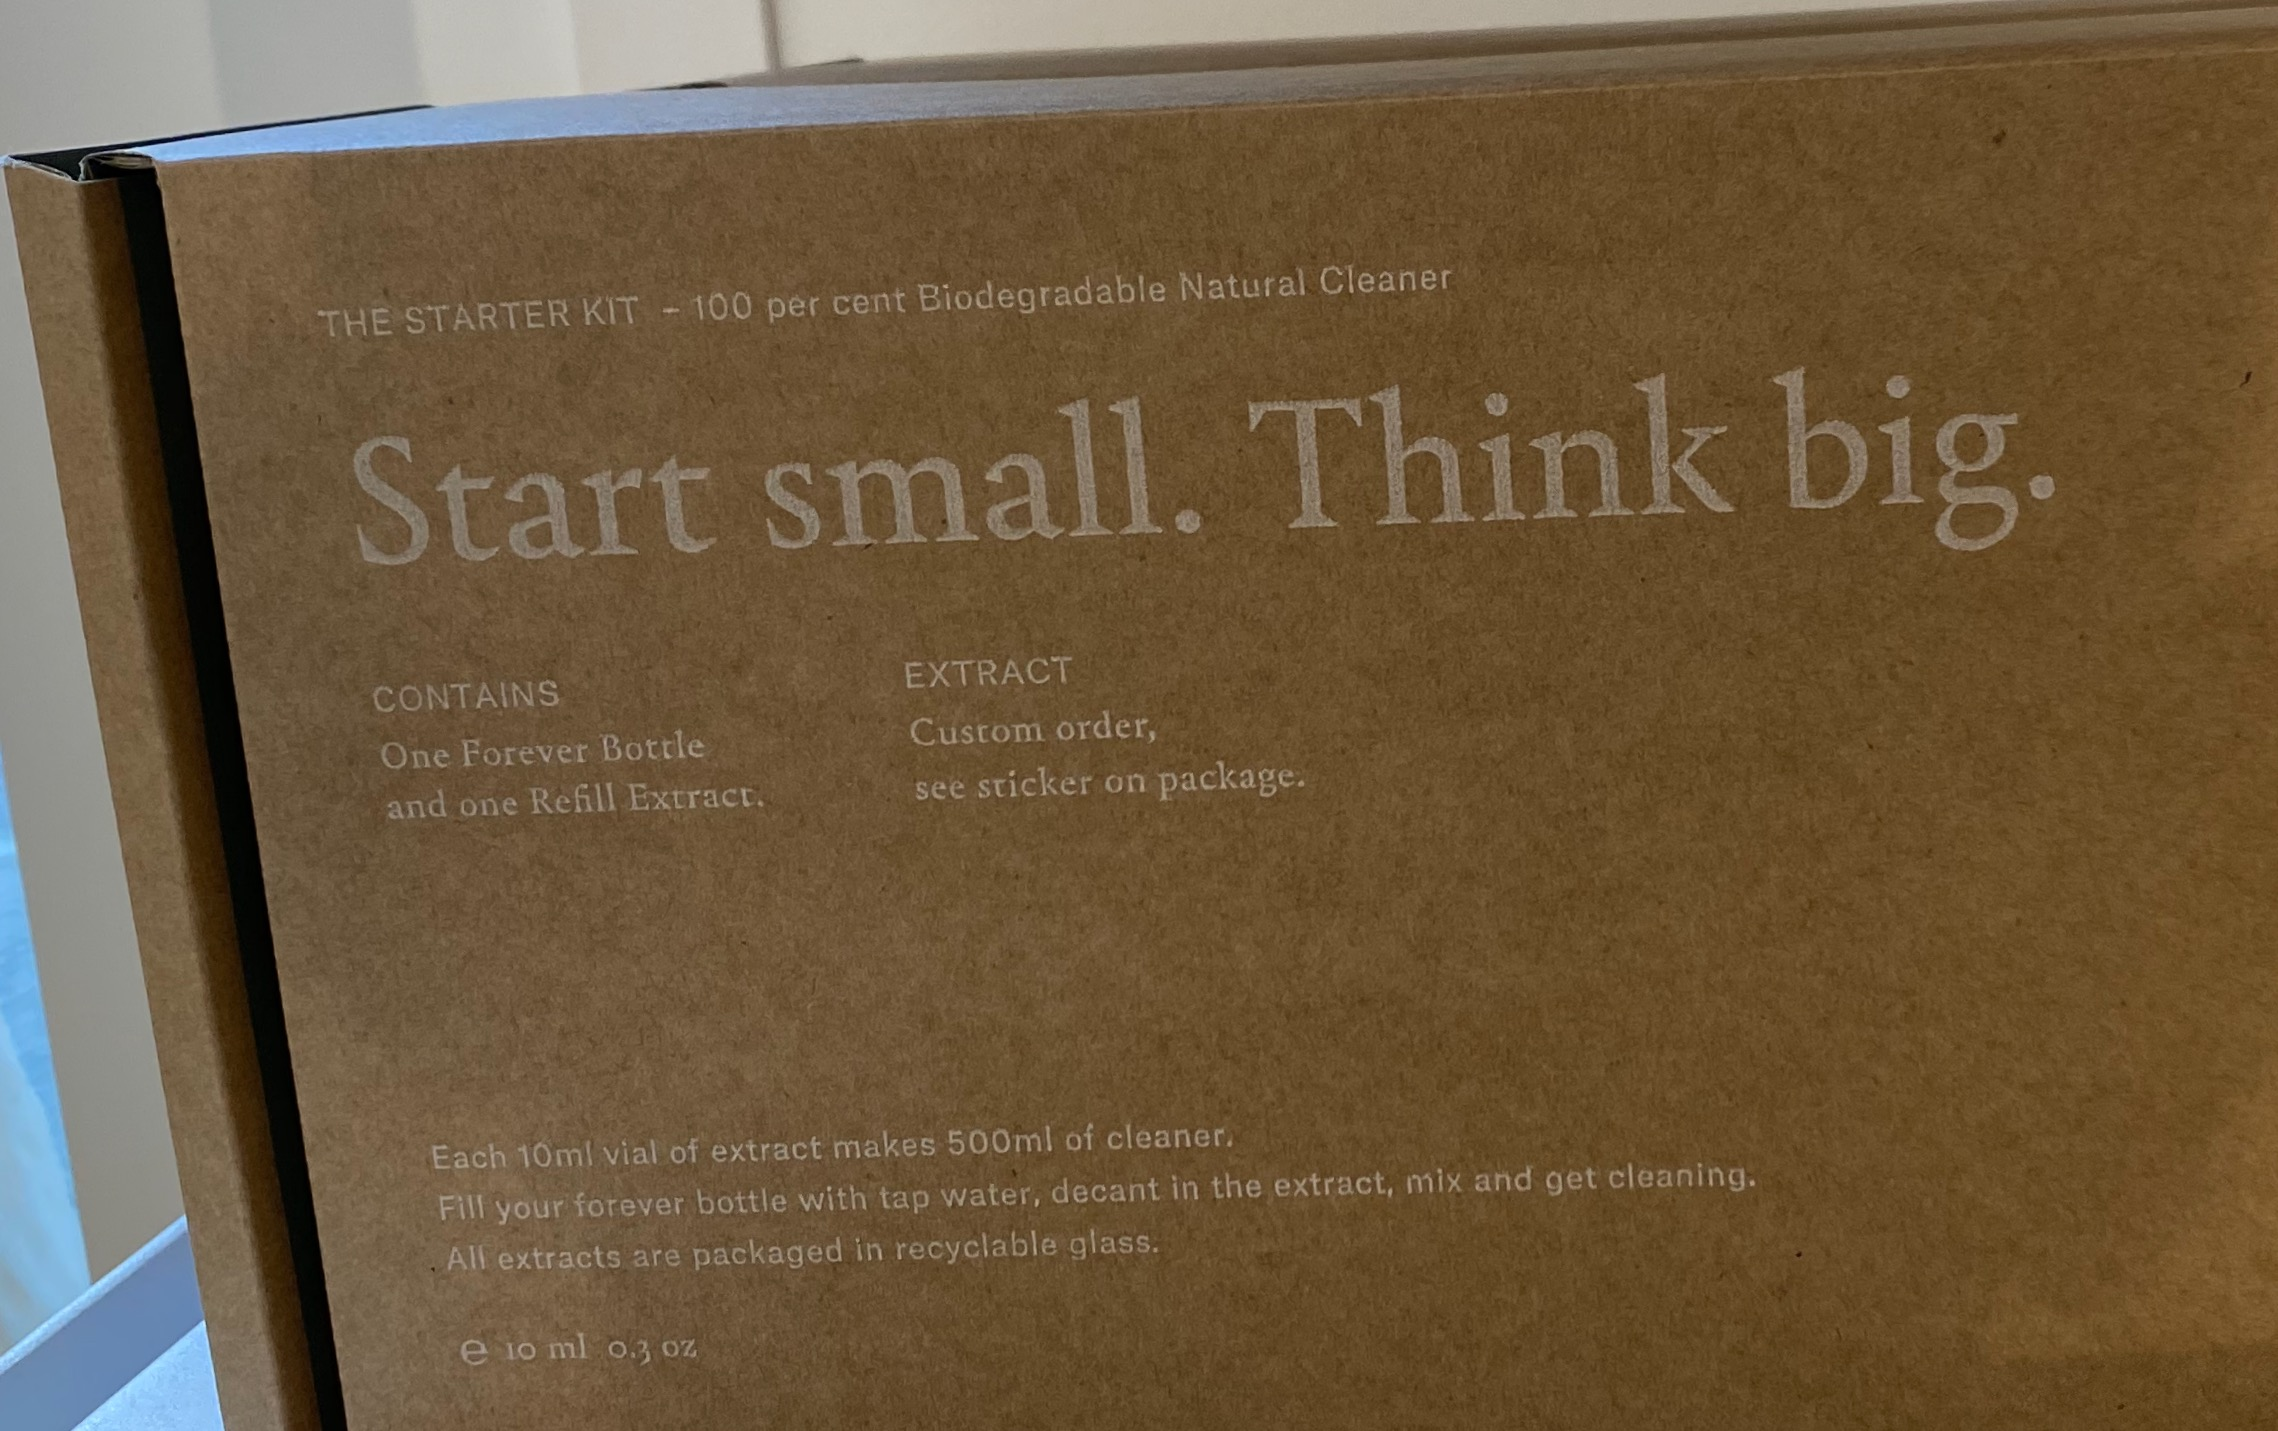 Start Small. Think Big